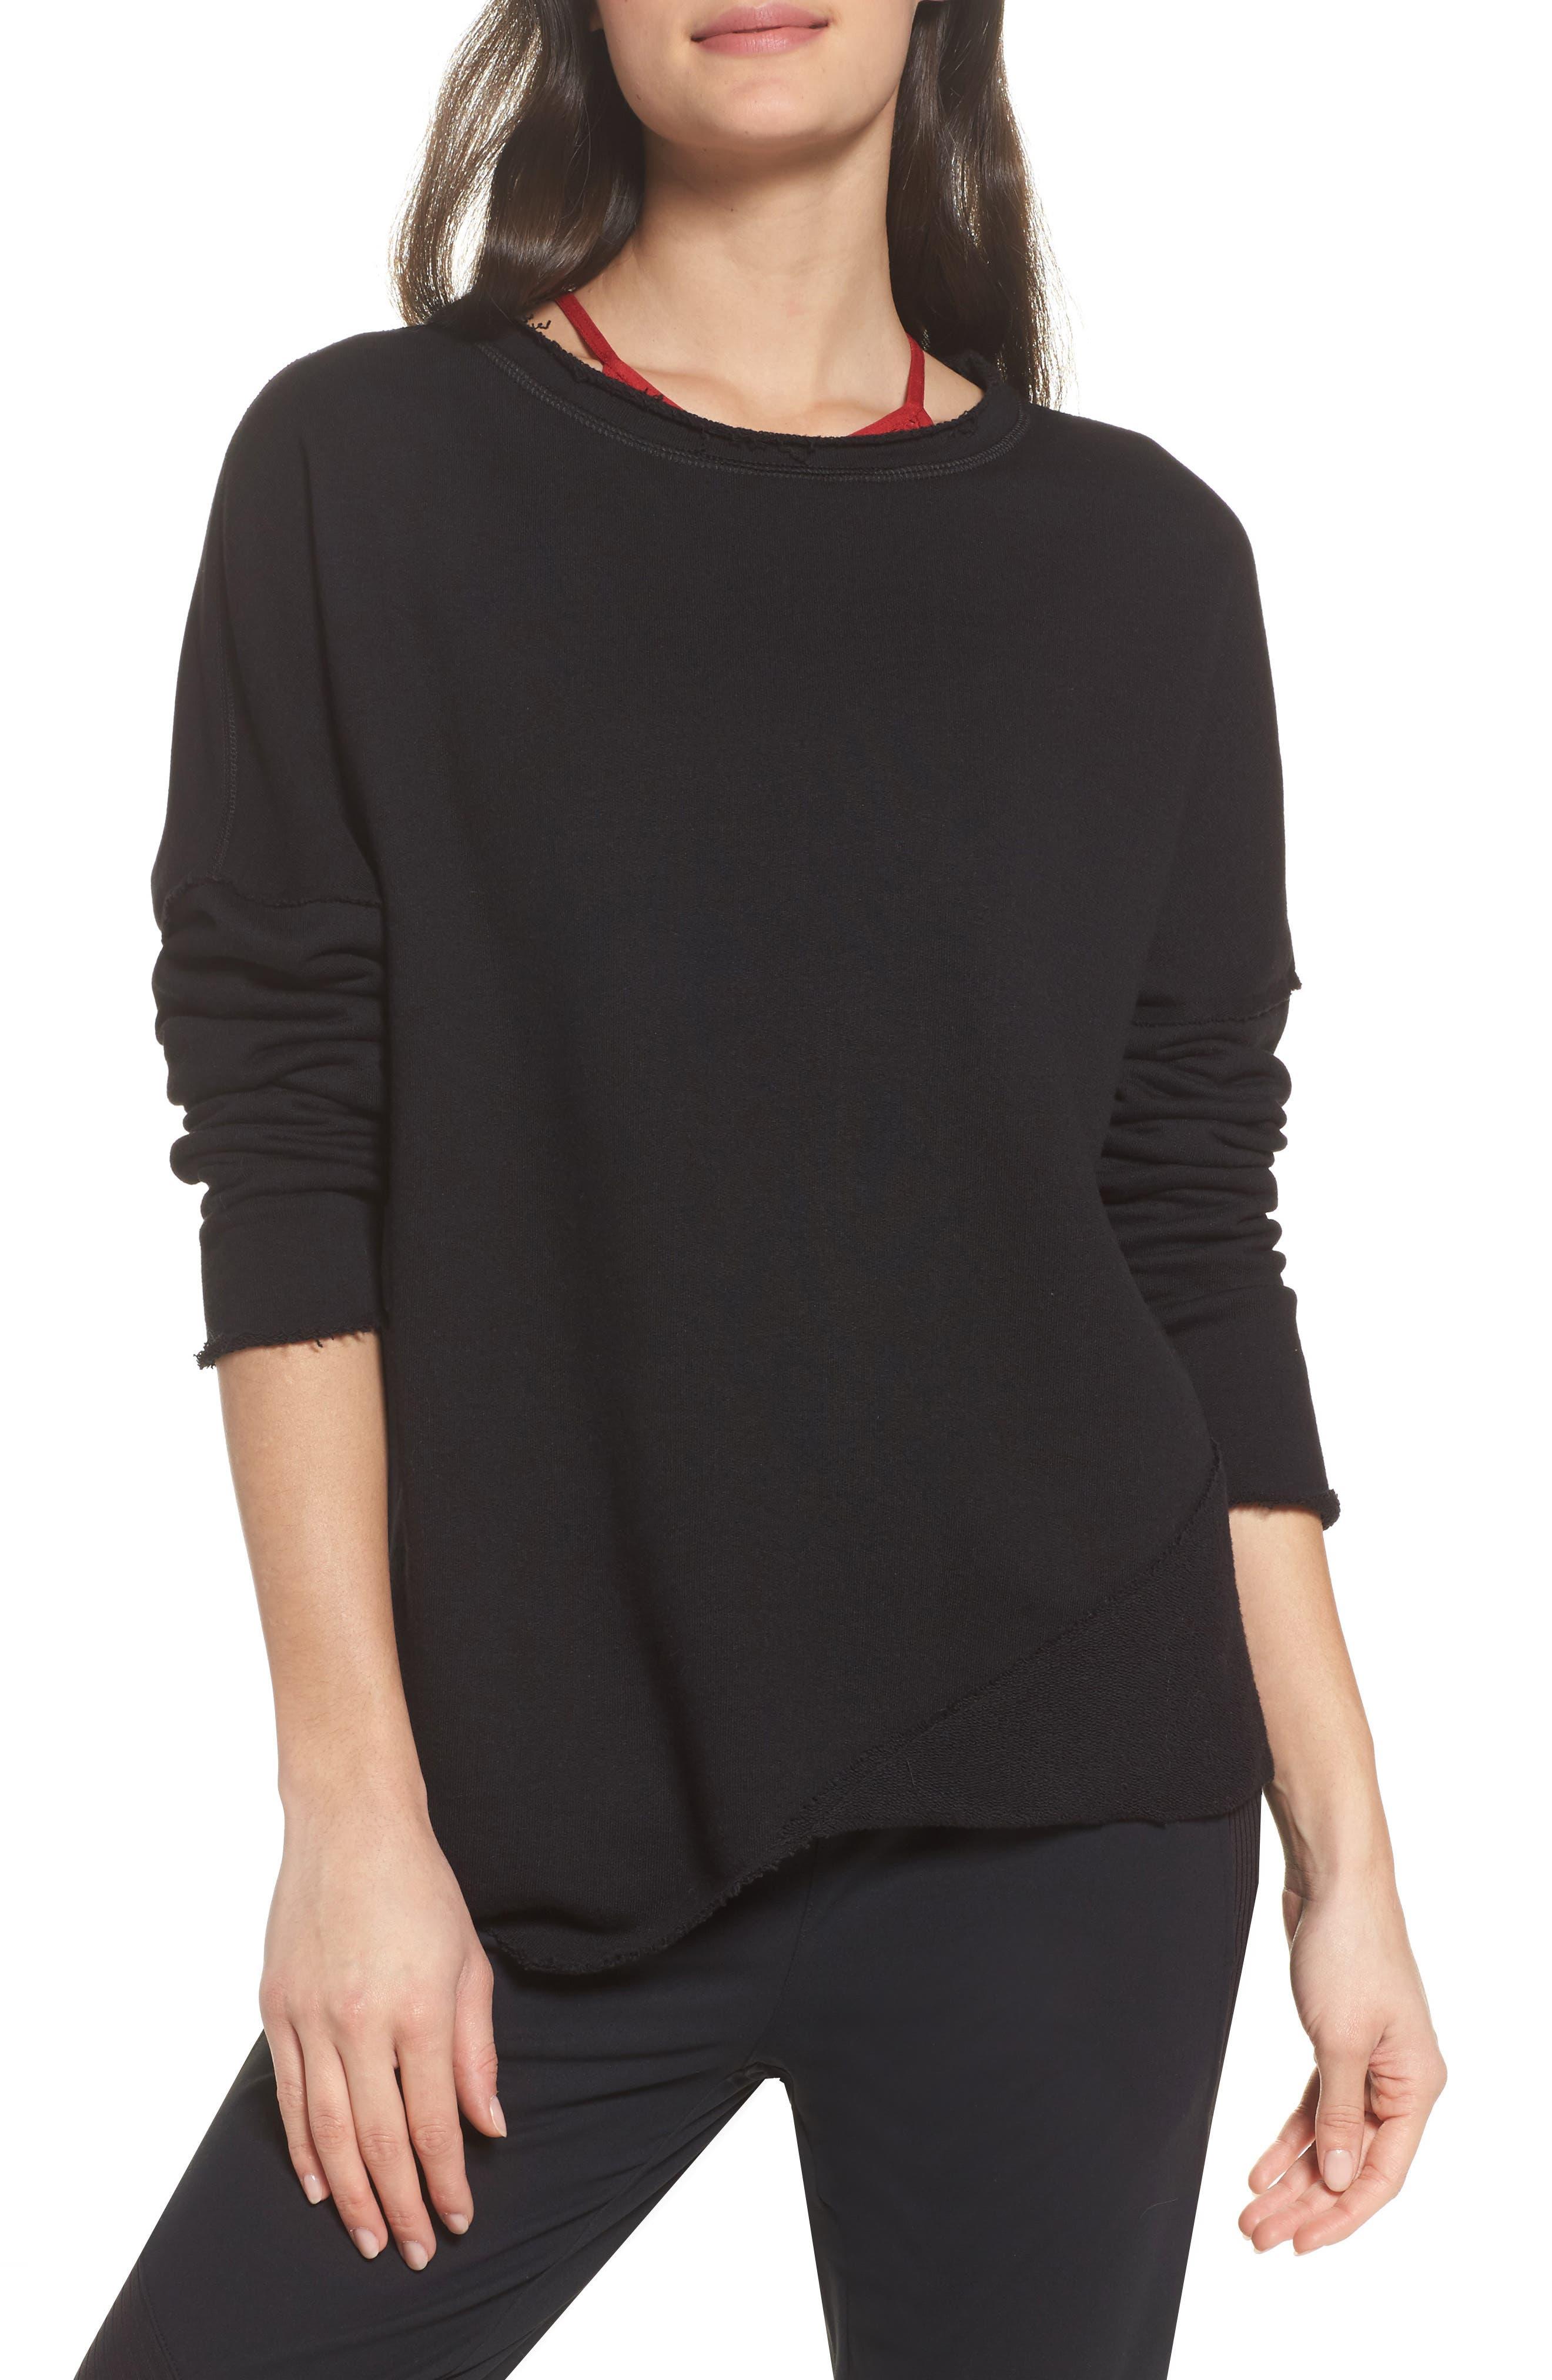 Exhale Sweatshirt,                         Main,                         color,